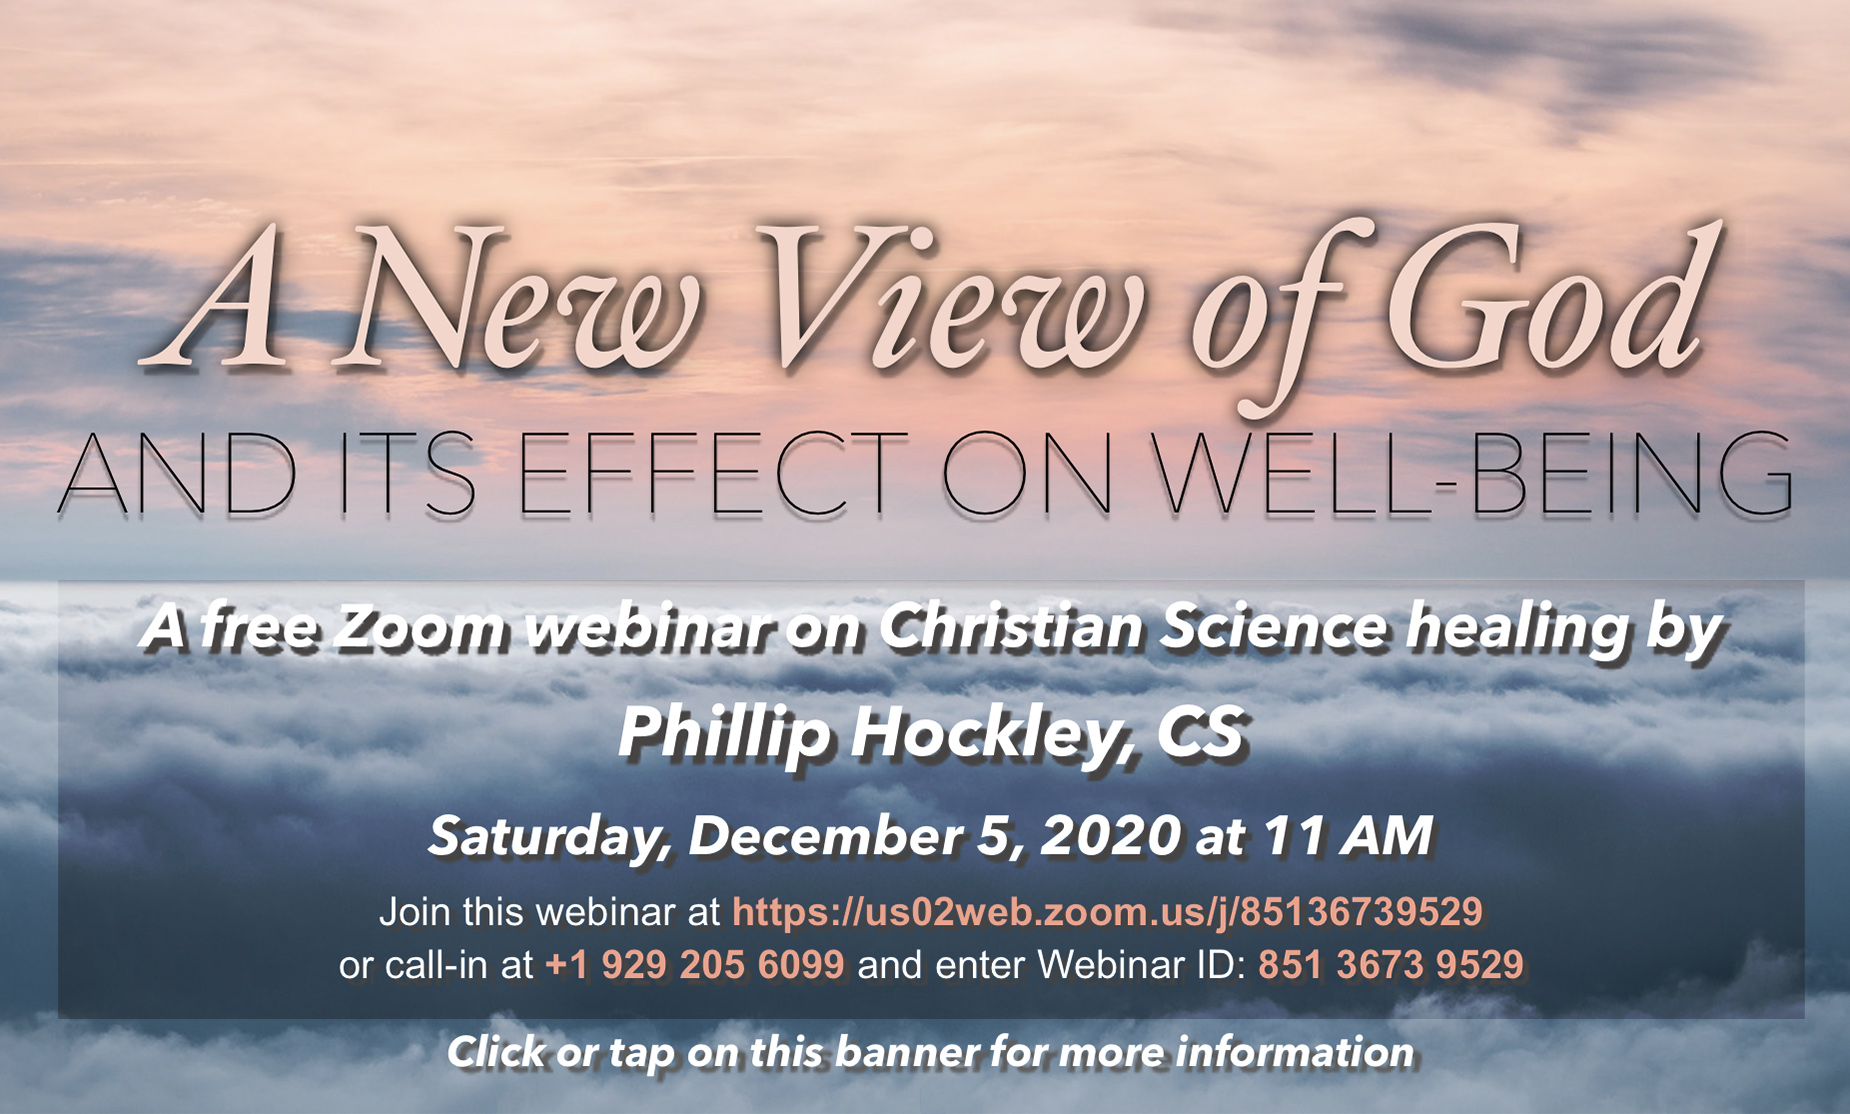 Webinar on Christian Science healing